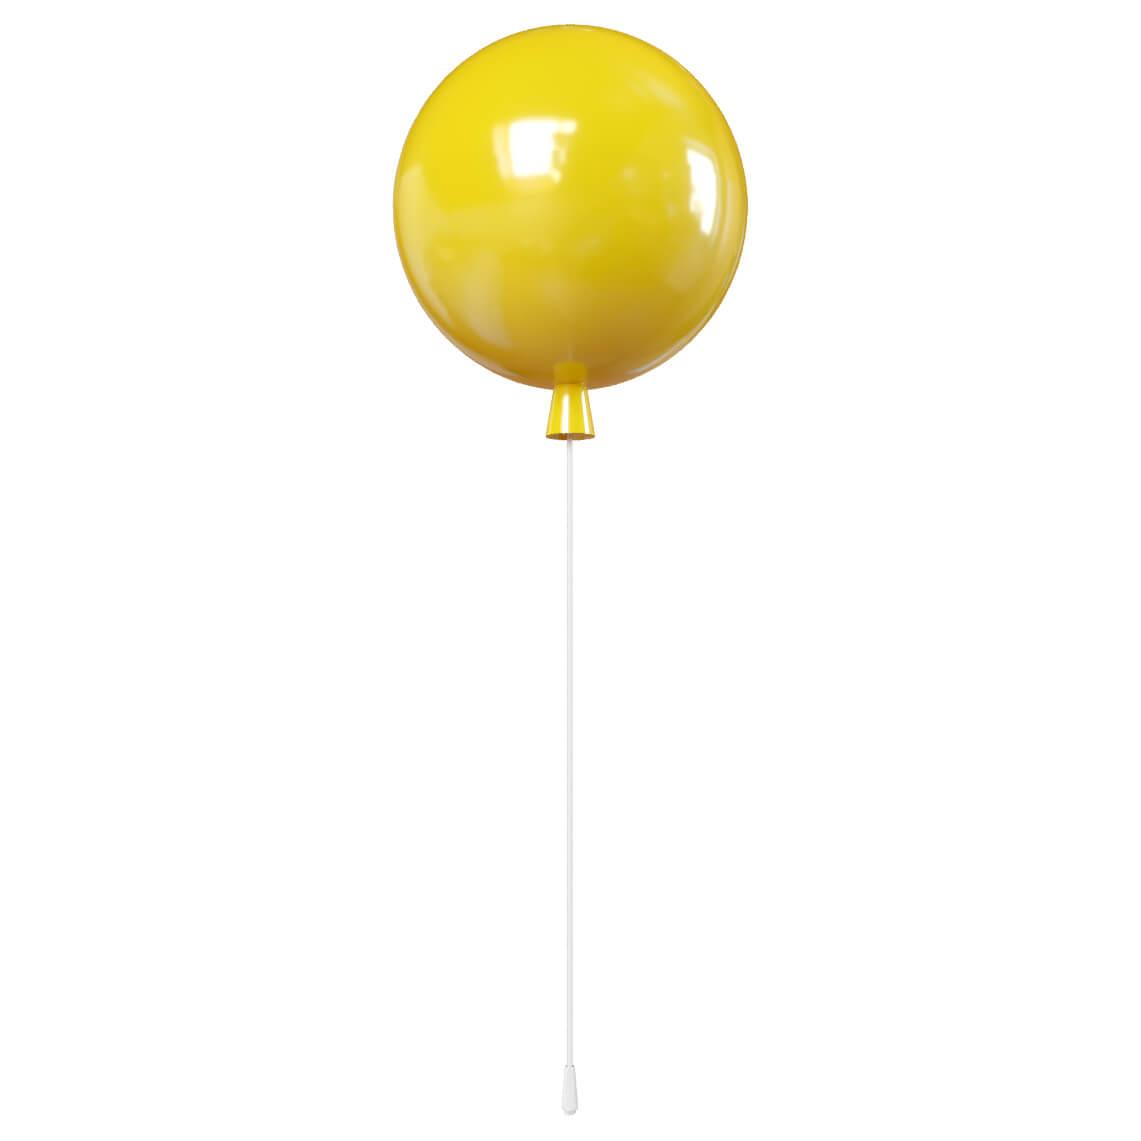 Светильник Loft IT 5055C/M yellow 5055 yellow потолочный светильник loft it 5055c m yellow